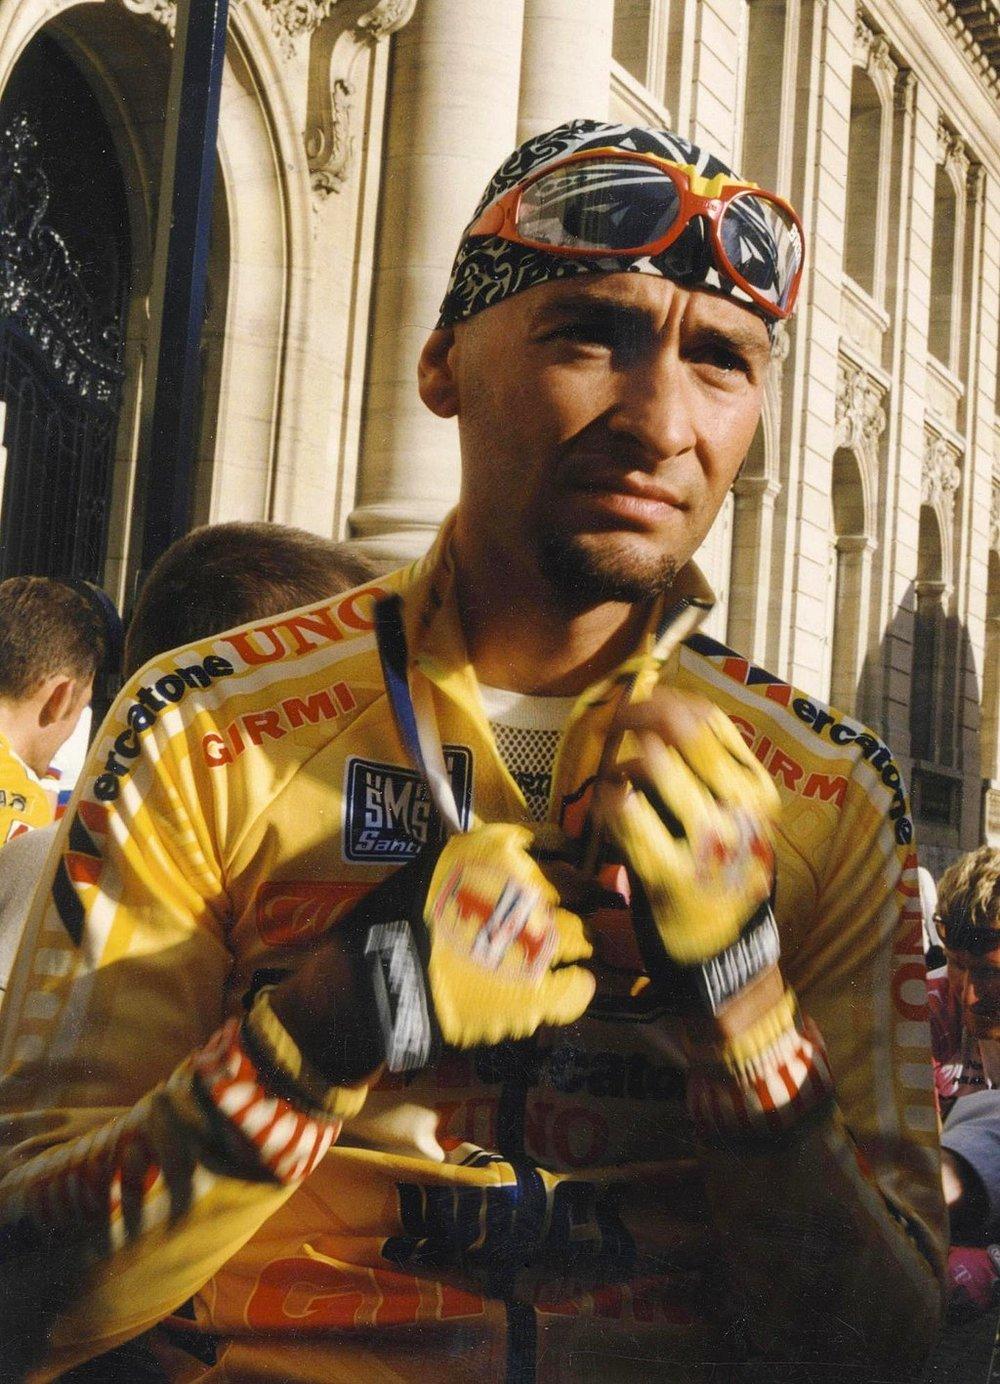 Marco Pantani 1997 (Foto: Aldo Bolzan, Wikimedia, CC BY-SA 3.0)